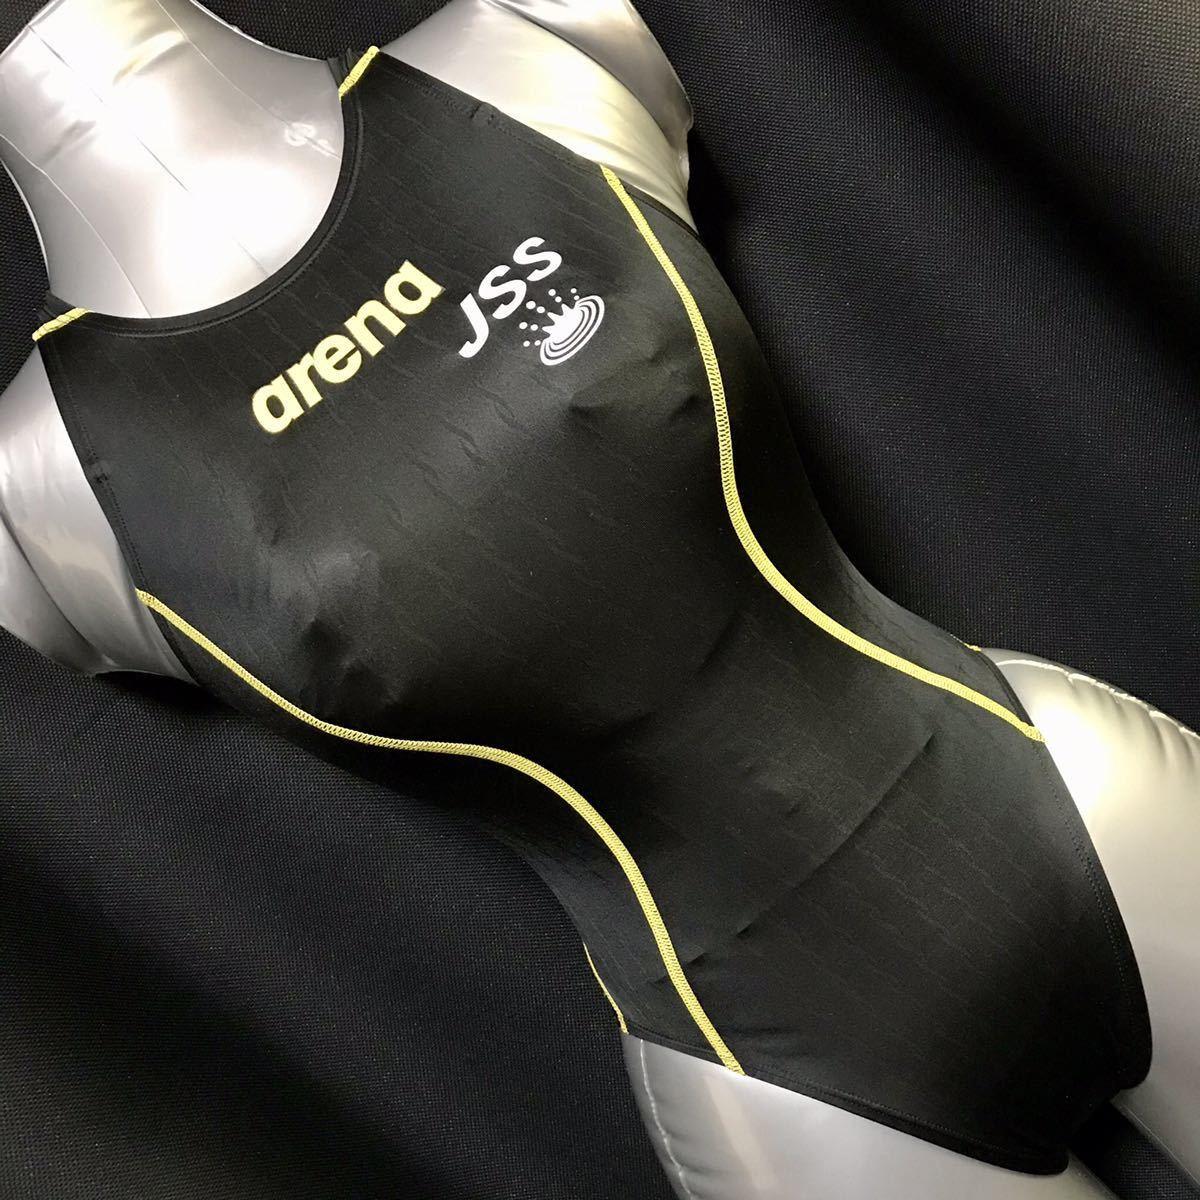 JSS 選手用 ハイカット 競泳水着 SSサイズ ARN-7021W X-PYTHON2 Xパイソン2 arena アリーナ リミック